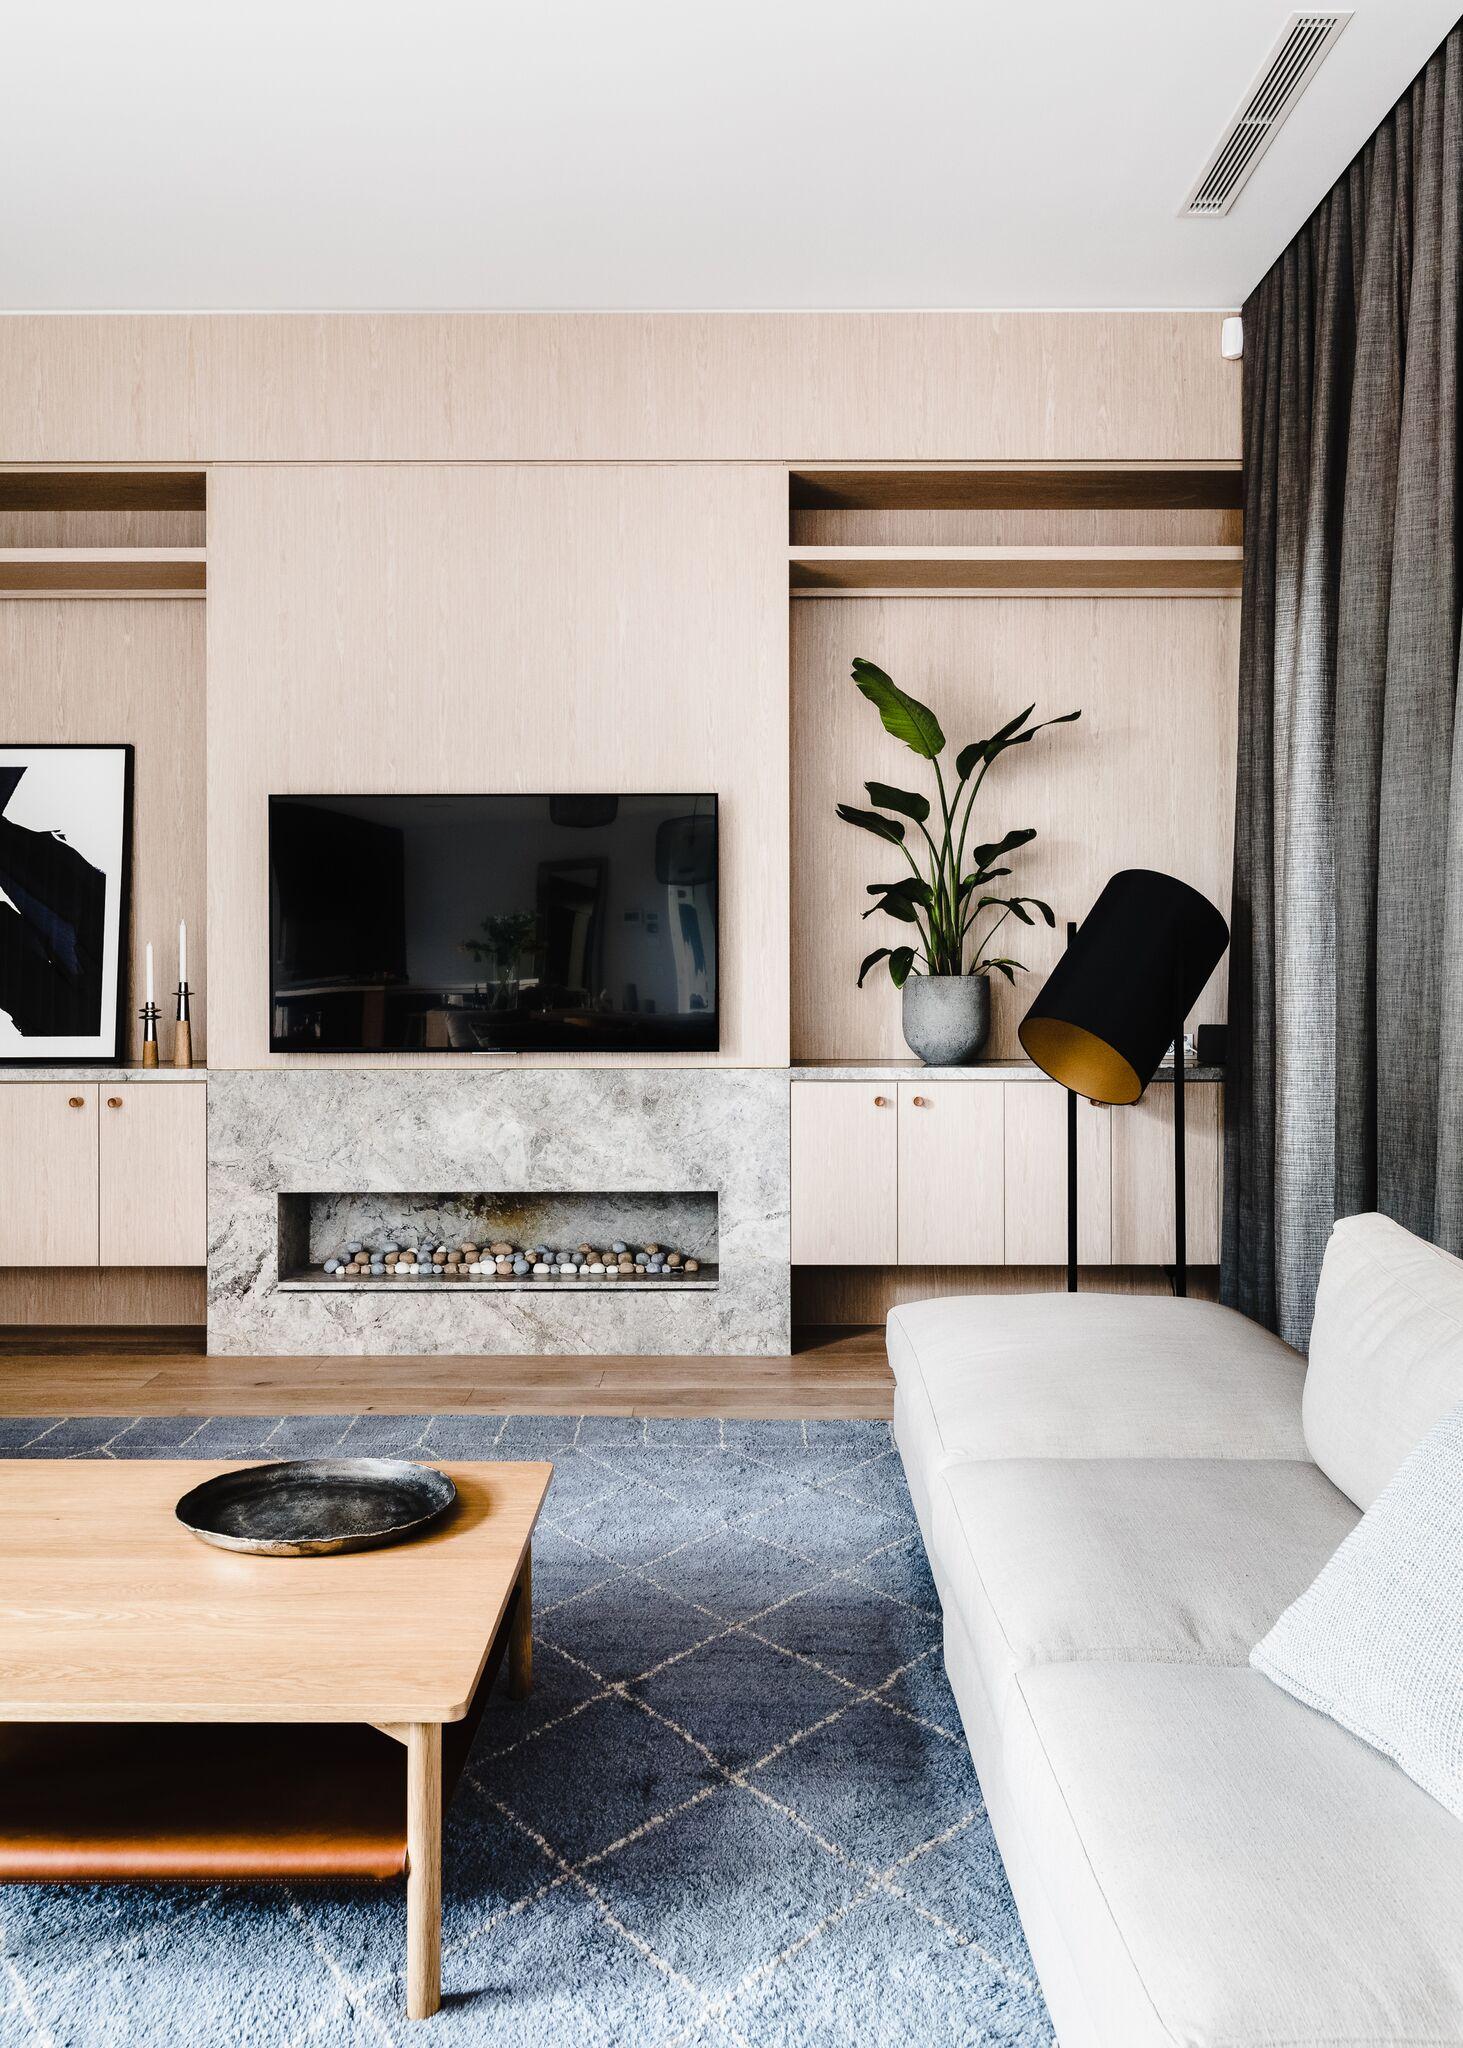 Gallery Of Balwyn Home By Studio Ezra Local Australian Interior Architecture Balwyn, Melbourne Image 7